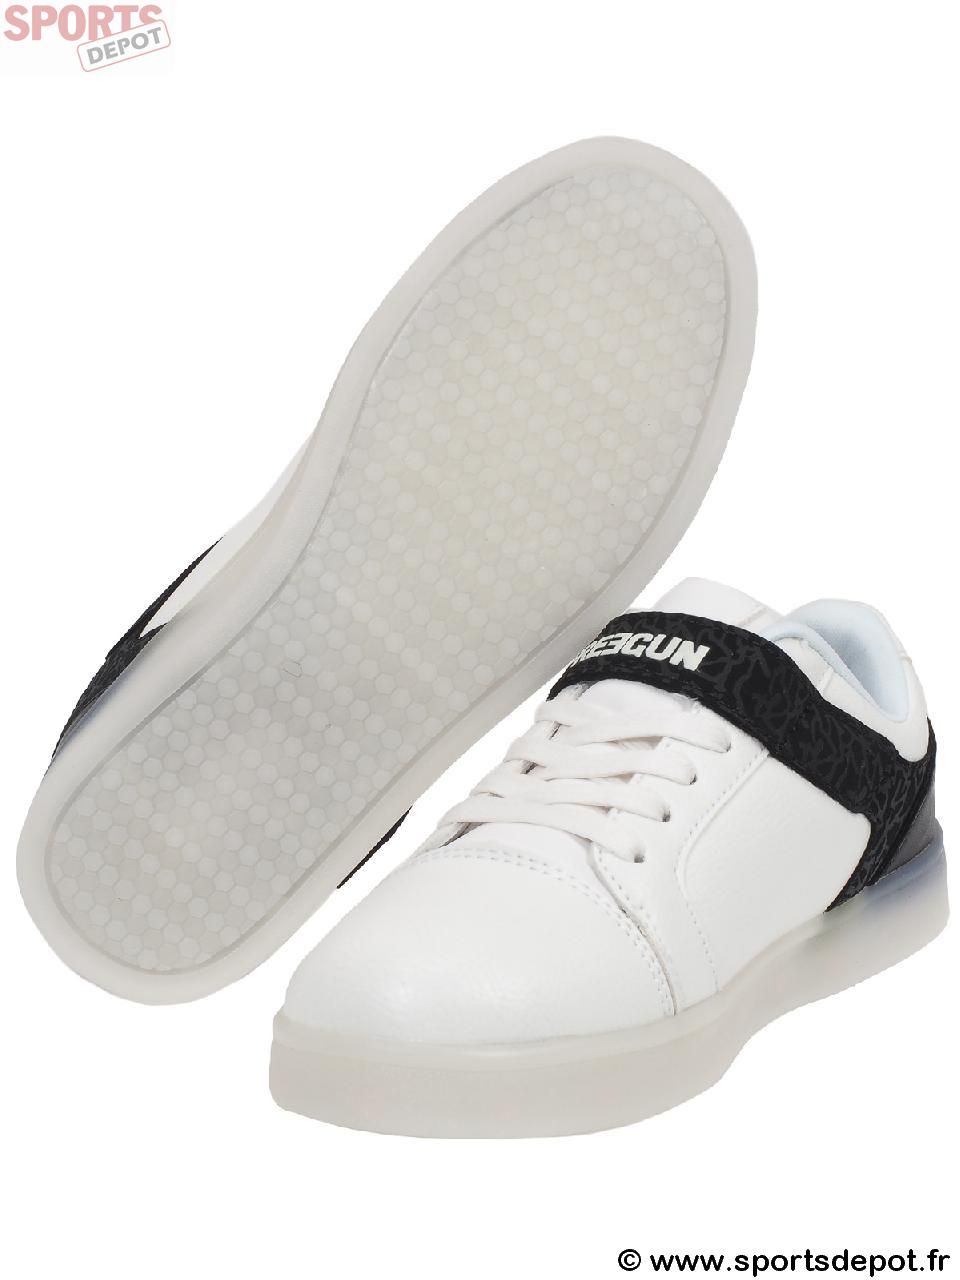 Ville Freegun Shoes Chaussures Mode Enfant Acheter Blc Led Oqwdo7 Basse n0X8PONwkZ